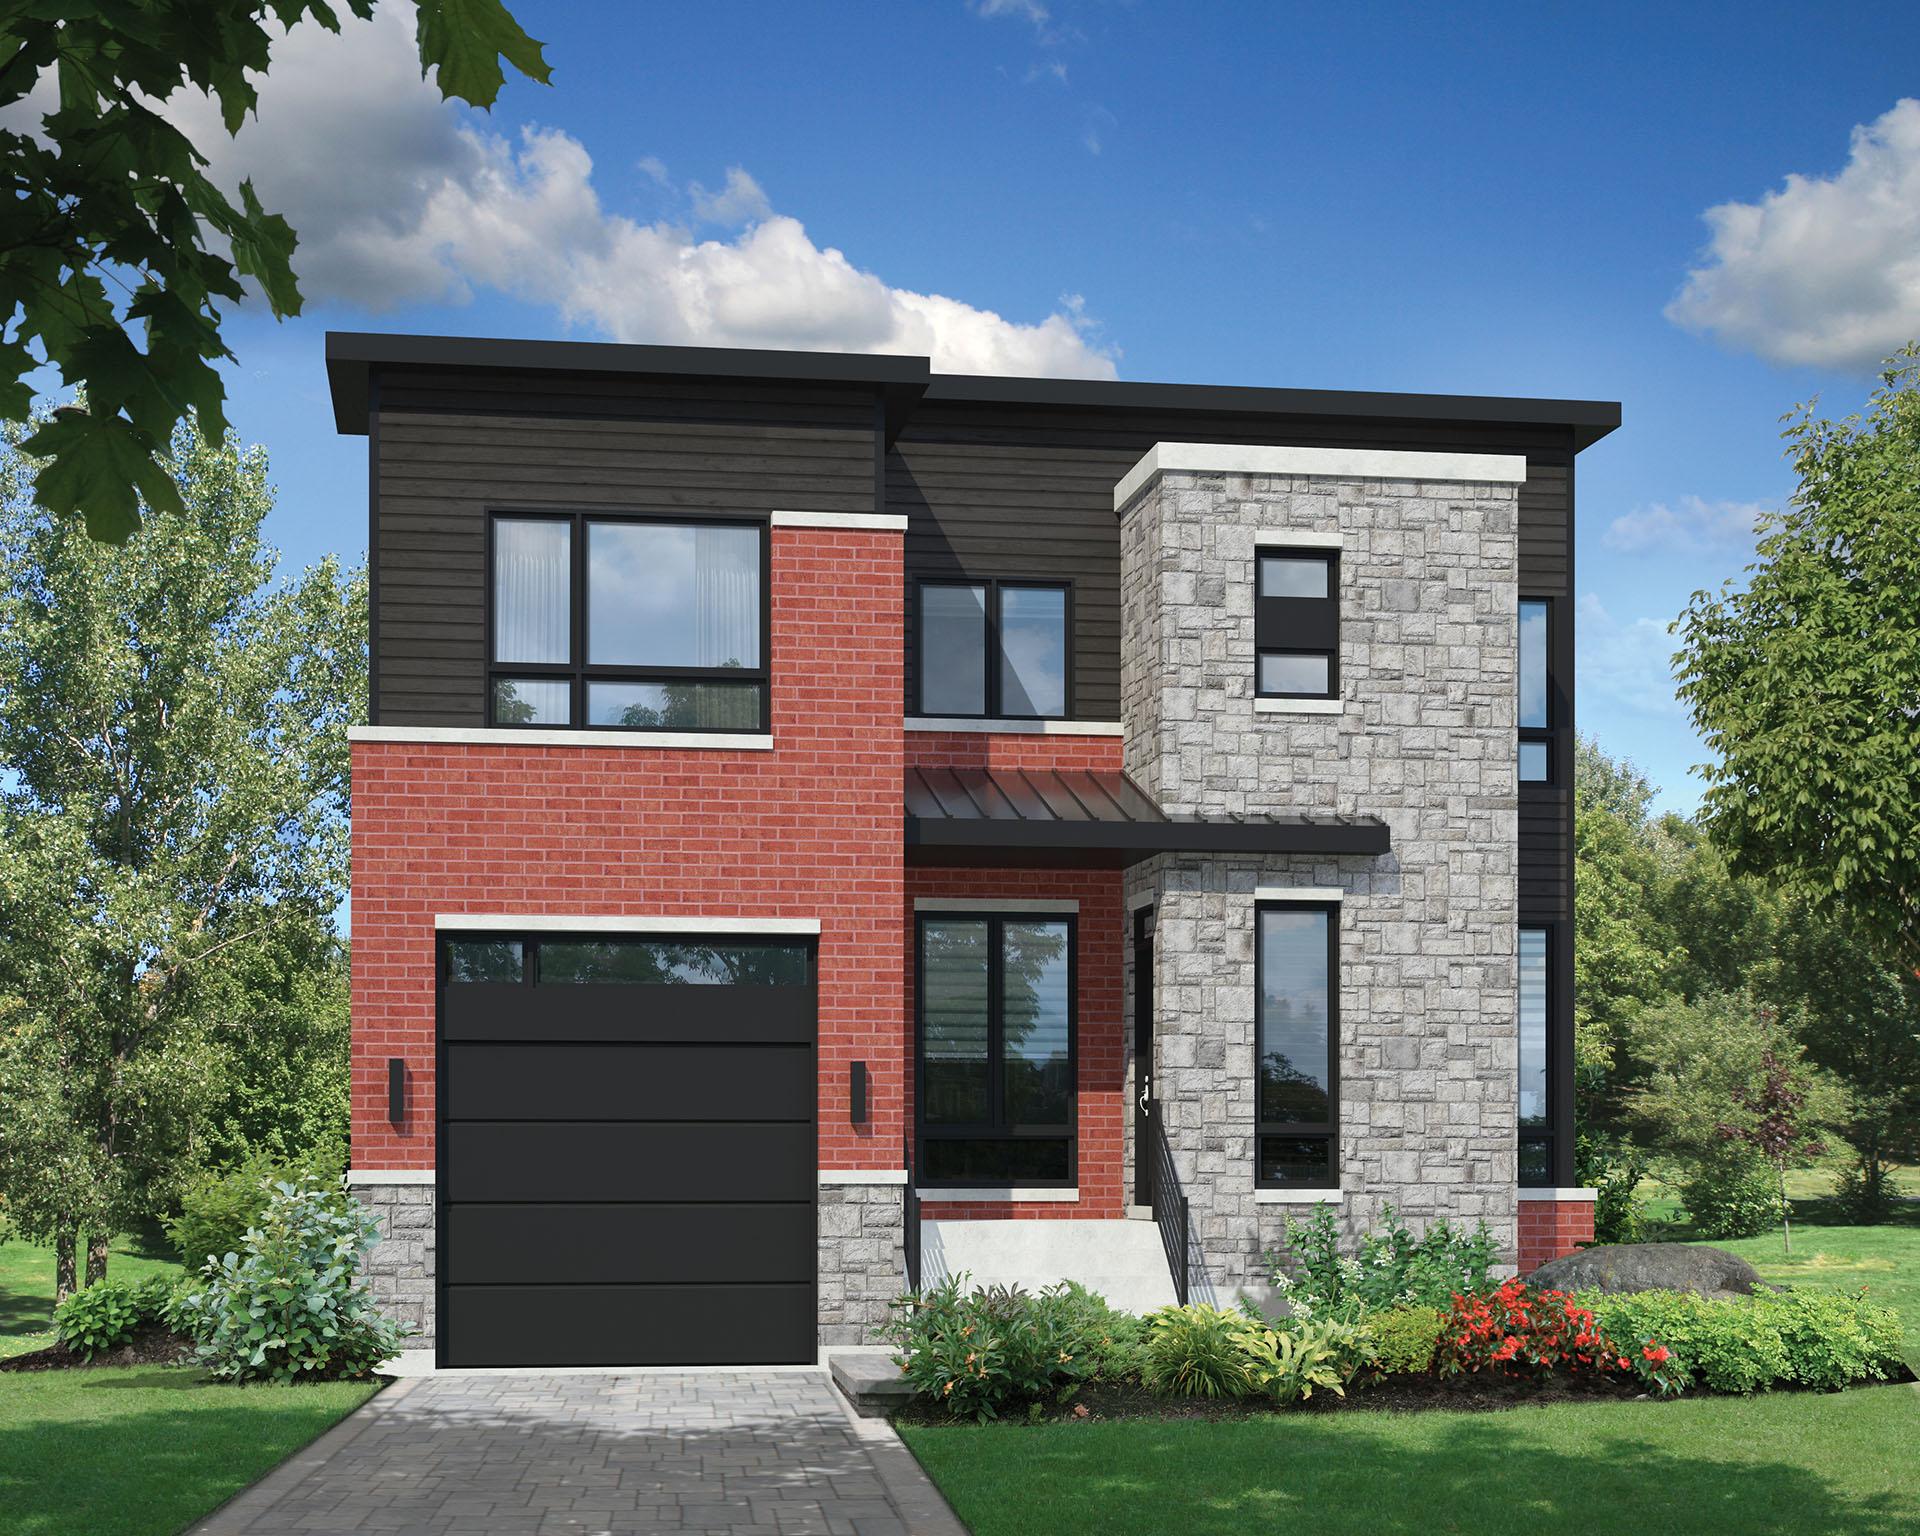 Open Concept Modern House Plan - 80830PM